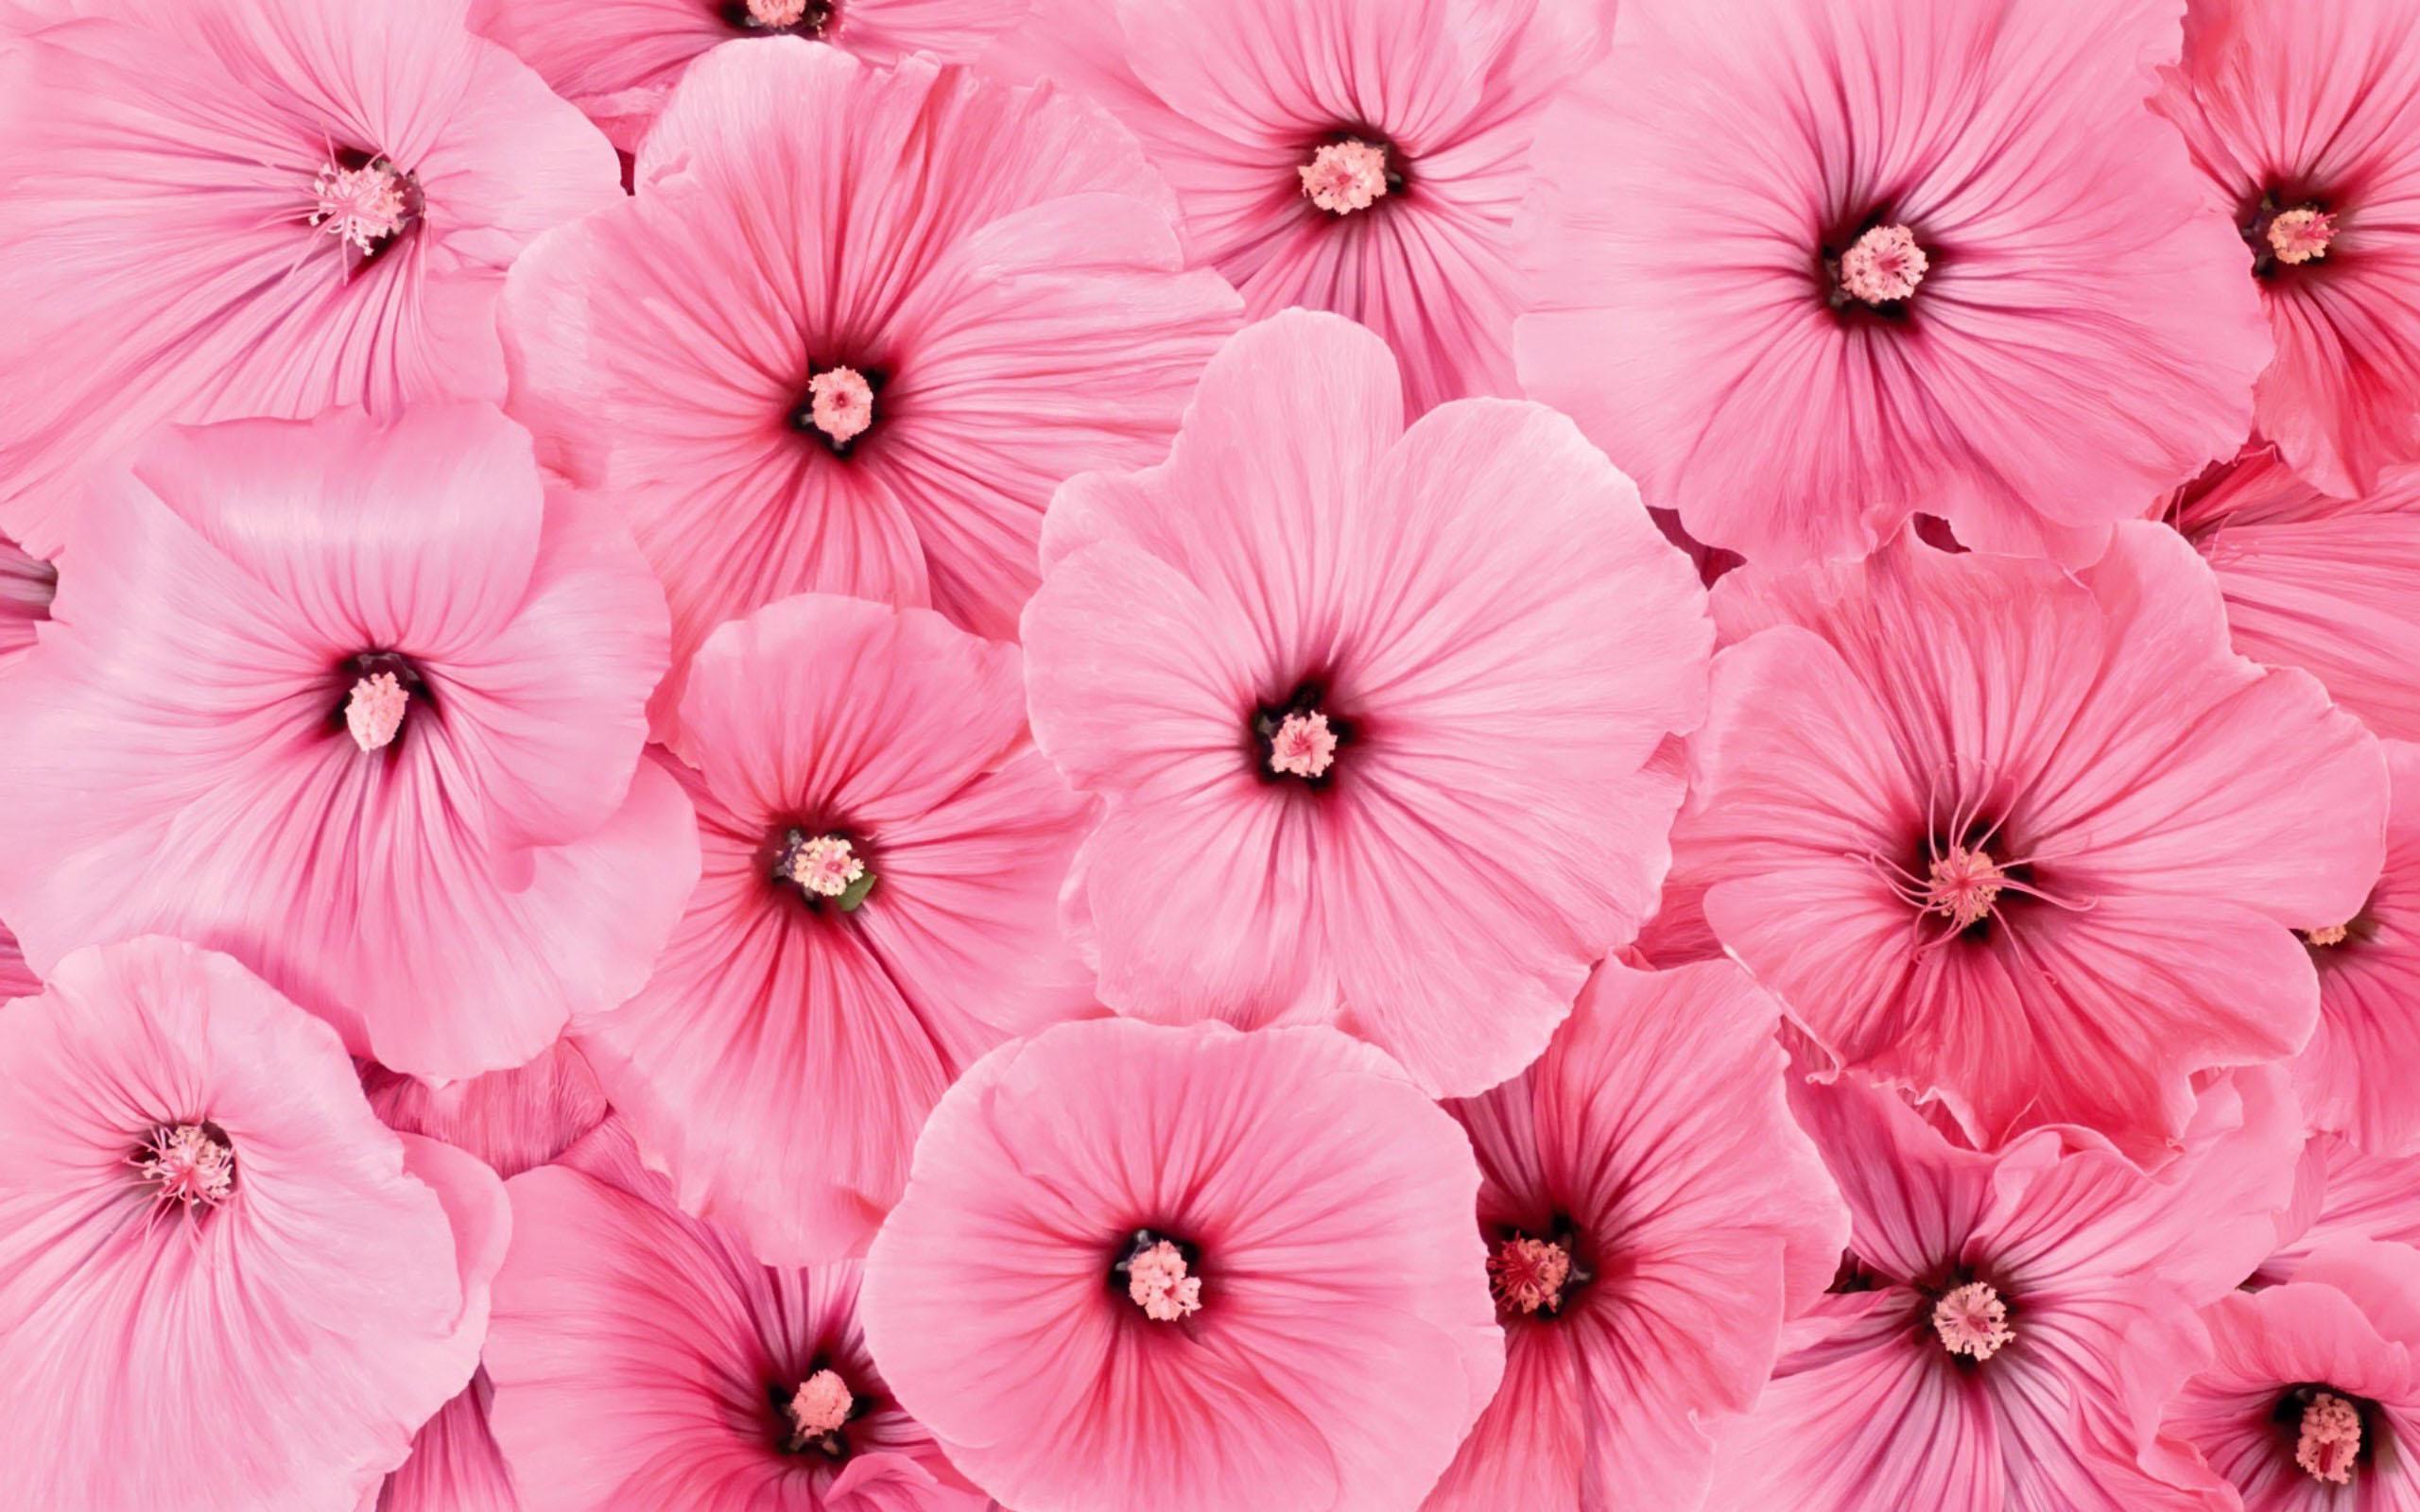 Beautiful Colorful Girls Anime Sakura Wallpaper Pink Flowers Wallpaper 2560x1600 51768